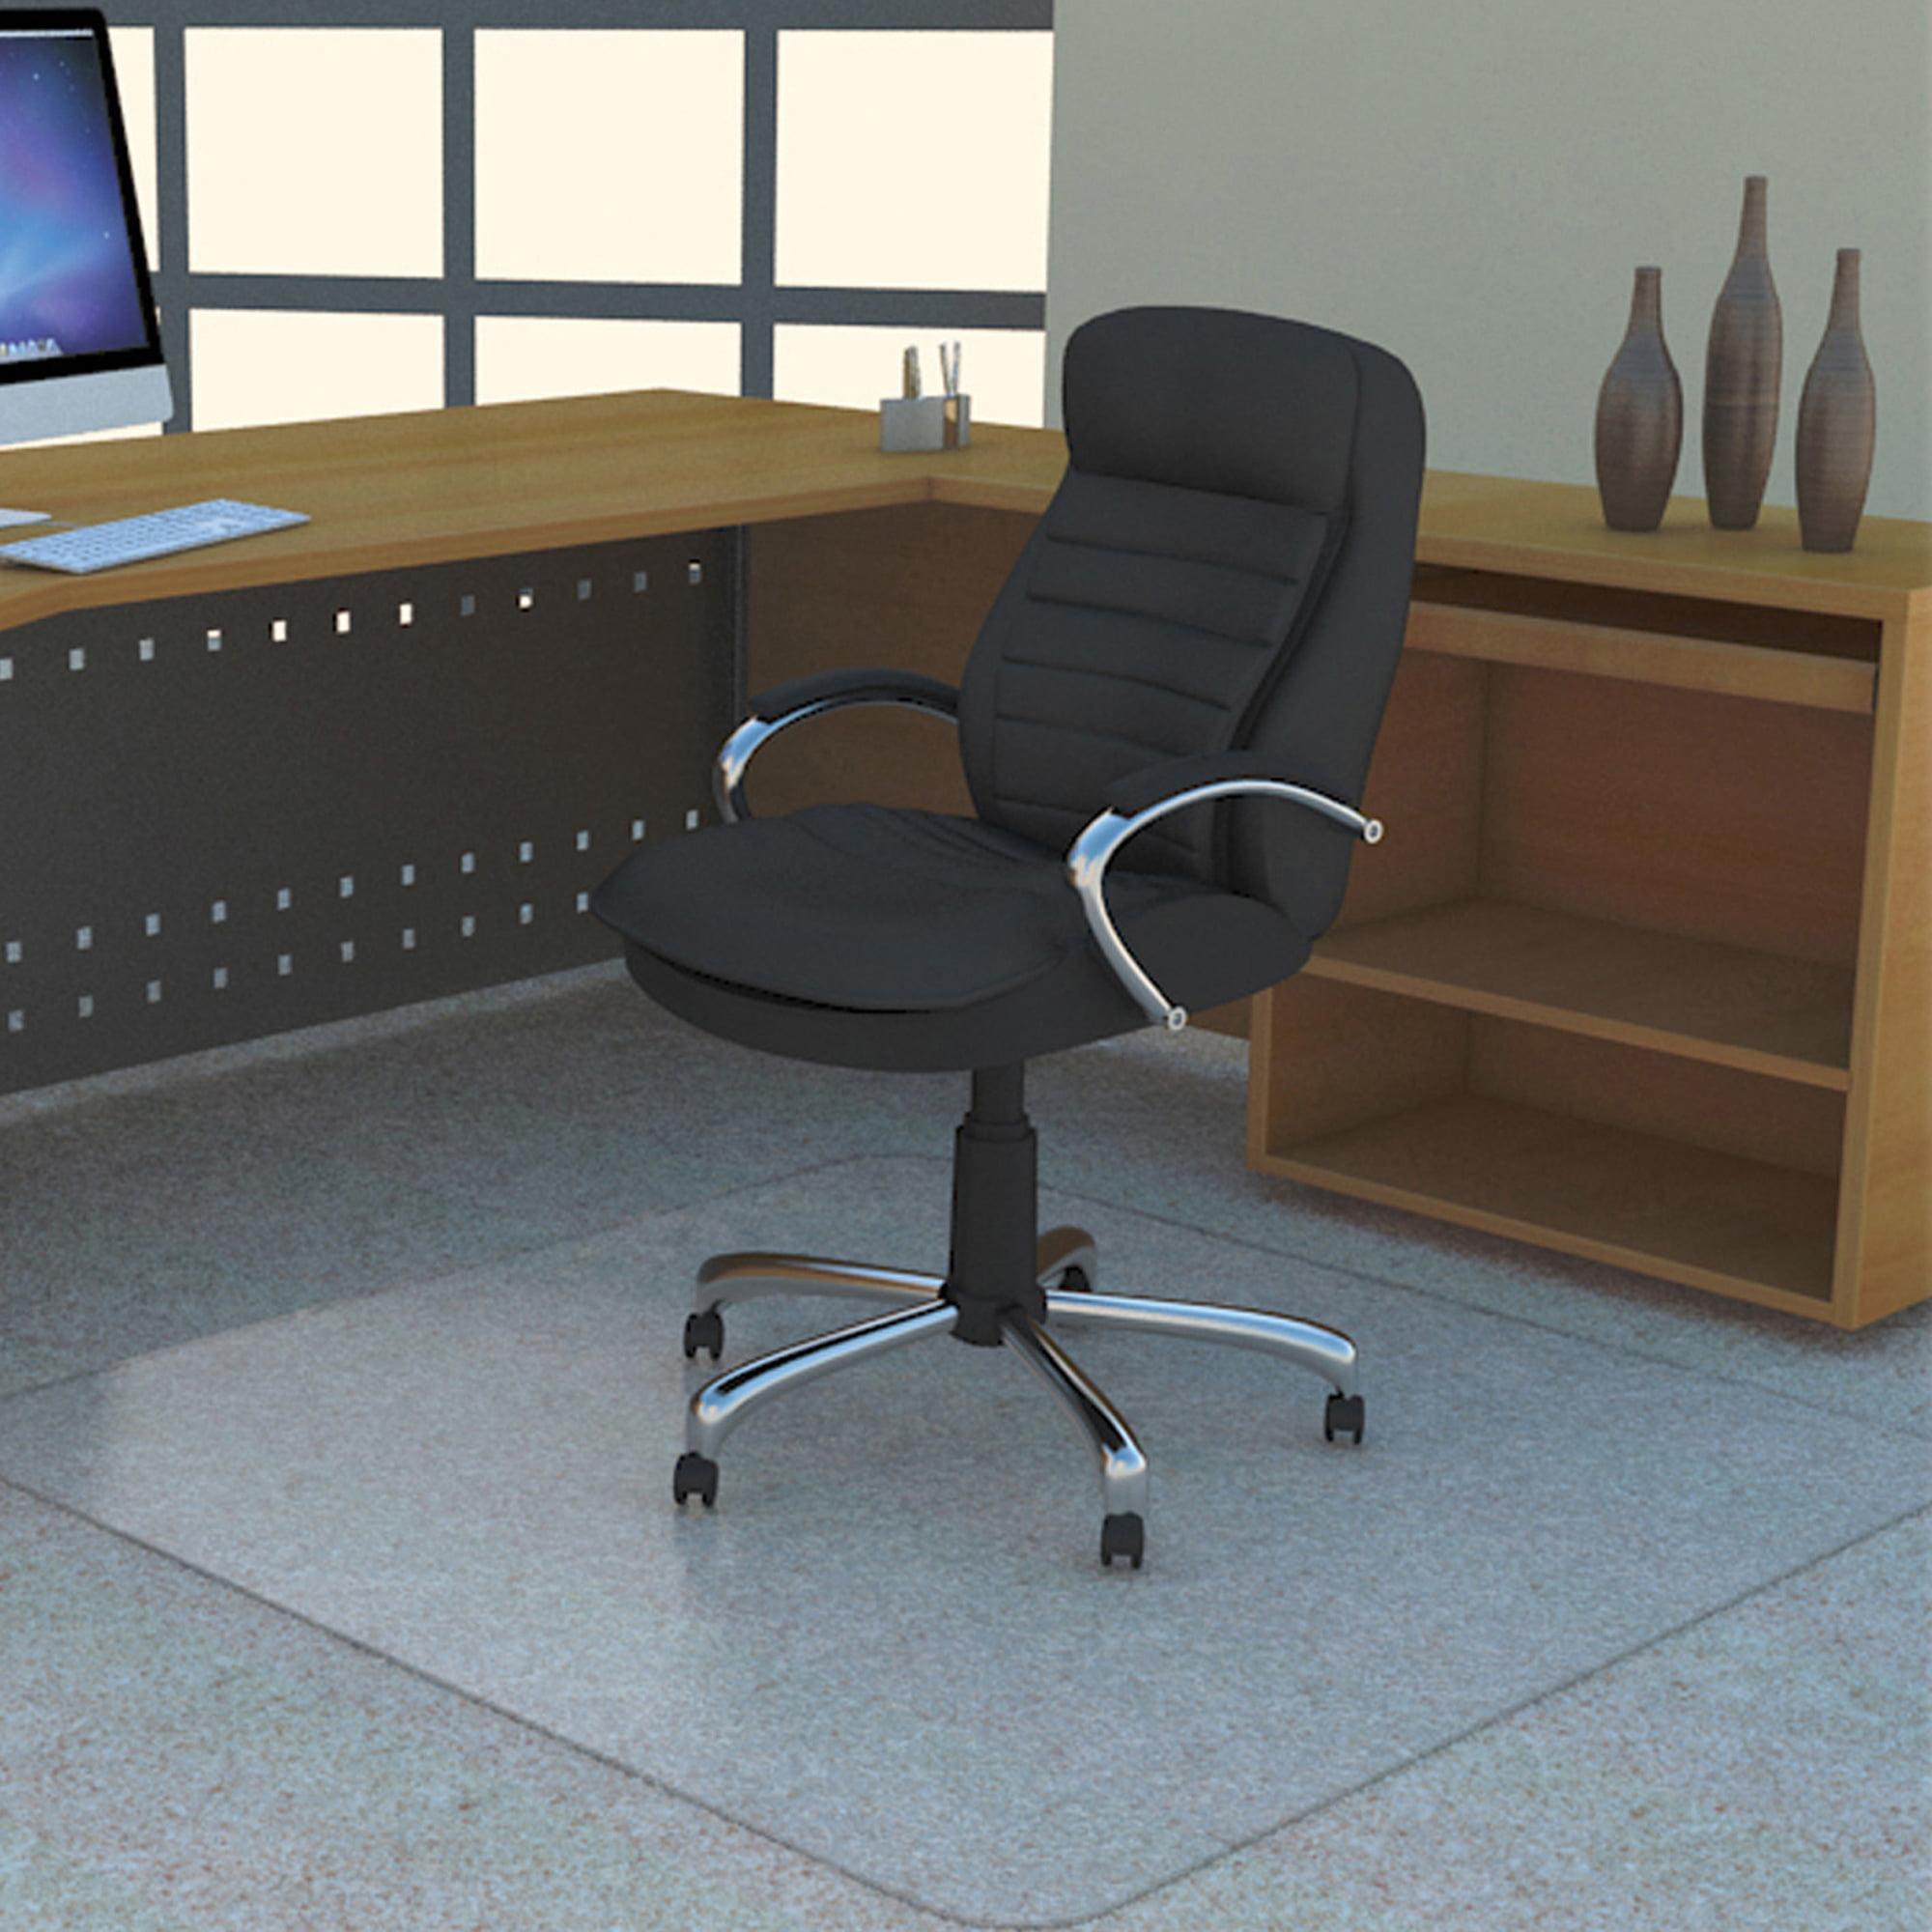 Deflecto 36 X 48 Chair Mat For Carpet And Hard Floor, Rectangular    Walmart.com